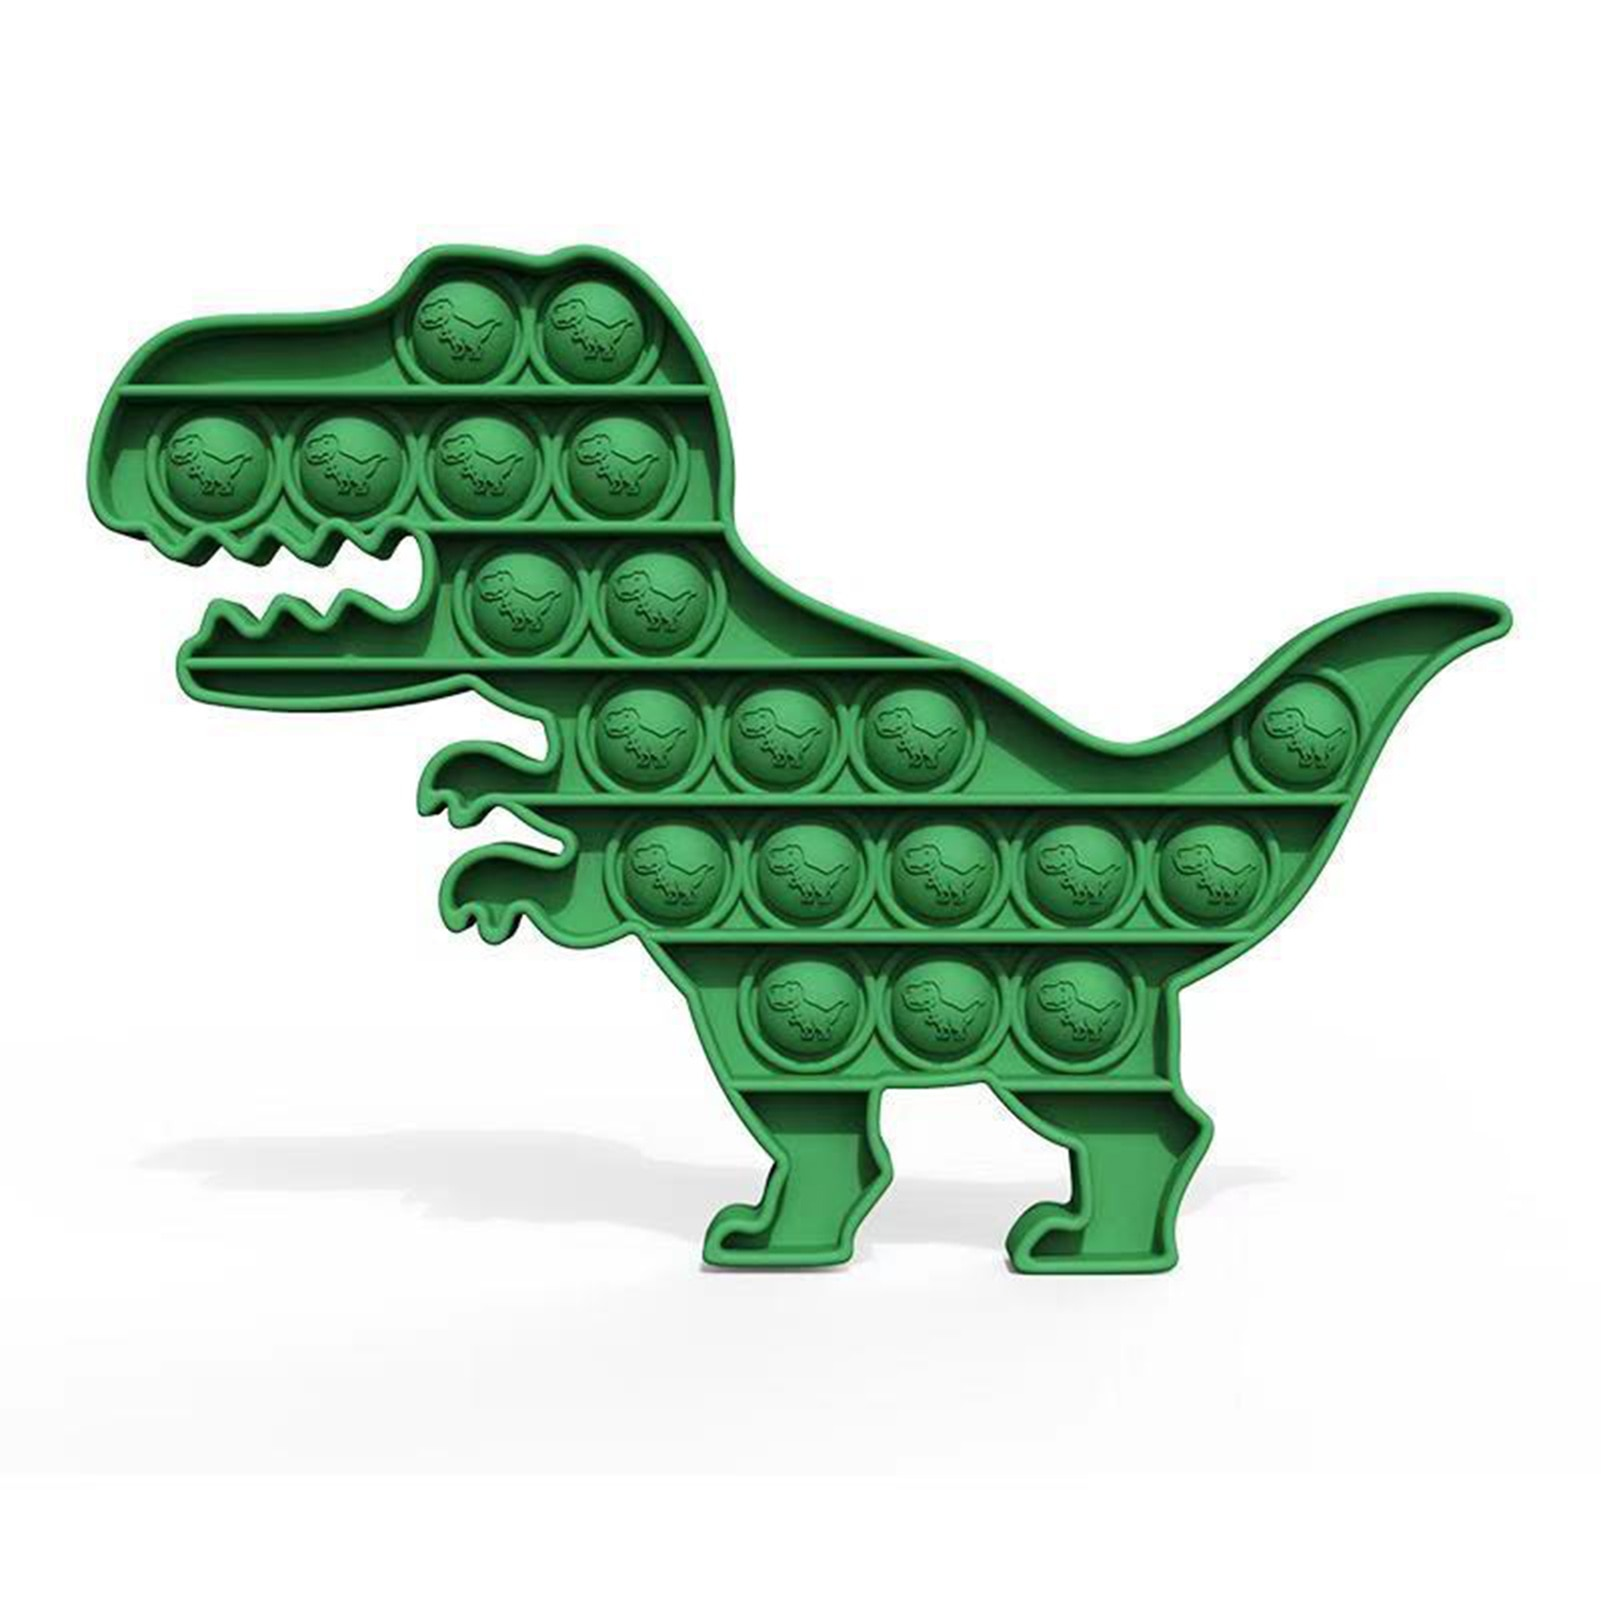 New Push Pop Bubble Fidget Antistress Toys Adult Kids Dinosaur Pop Fidget It Sensory Toy Autism Spec